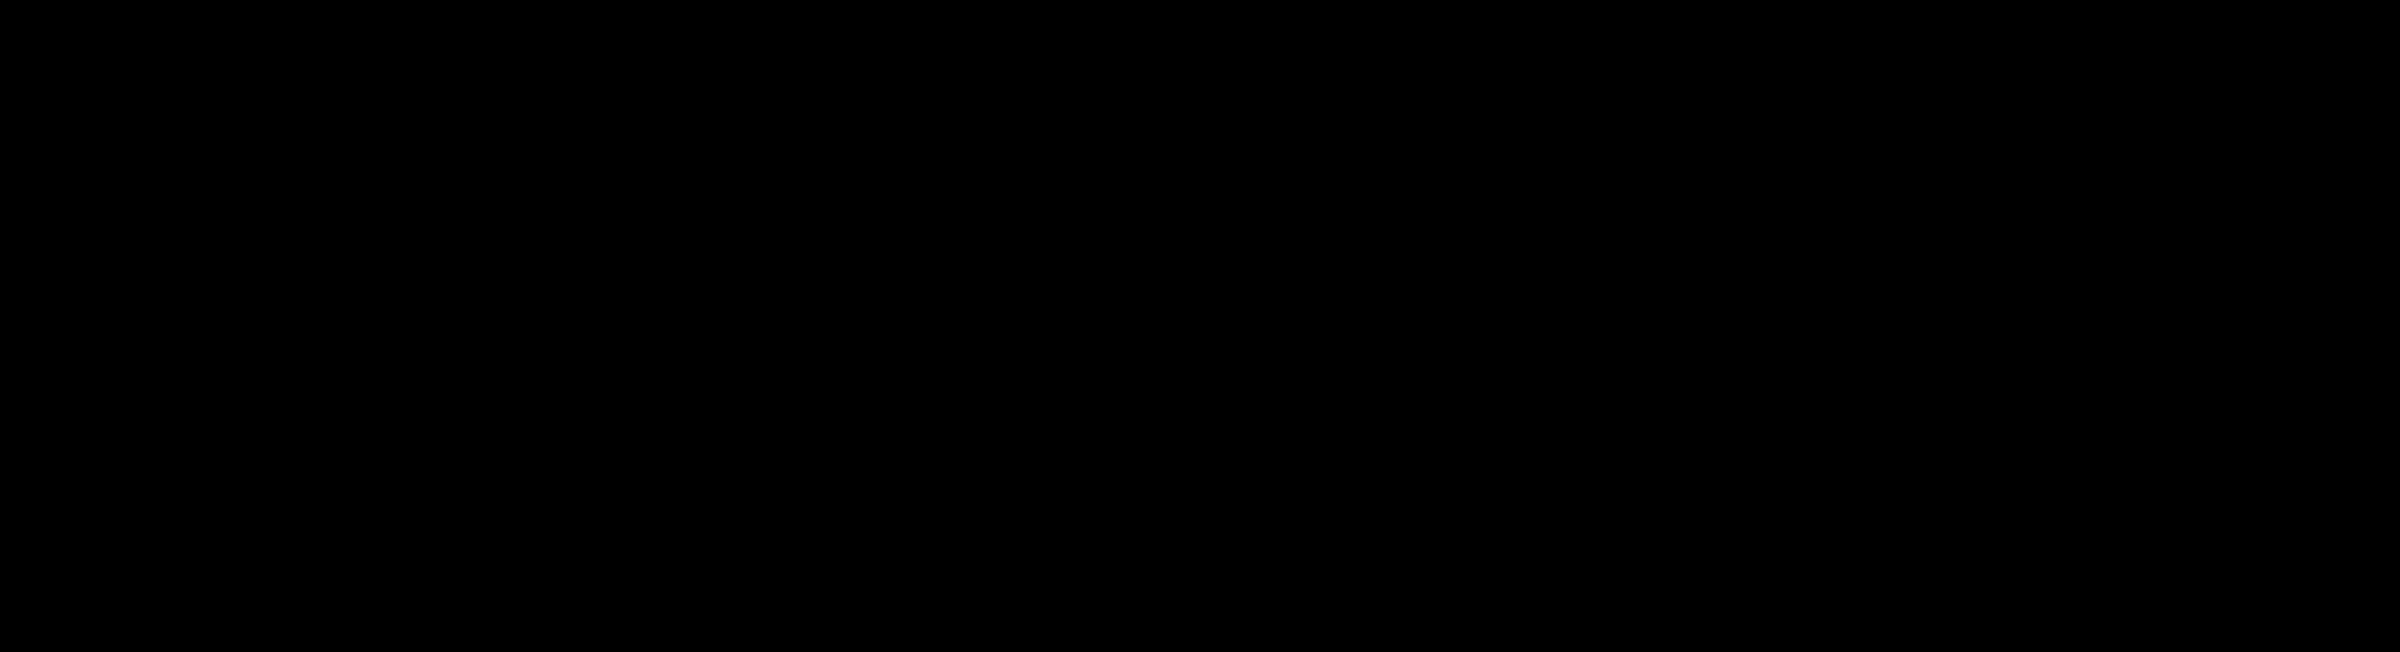 champion-logo-logo-png-transparent.png